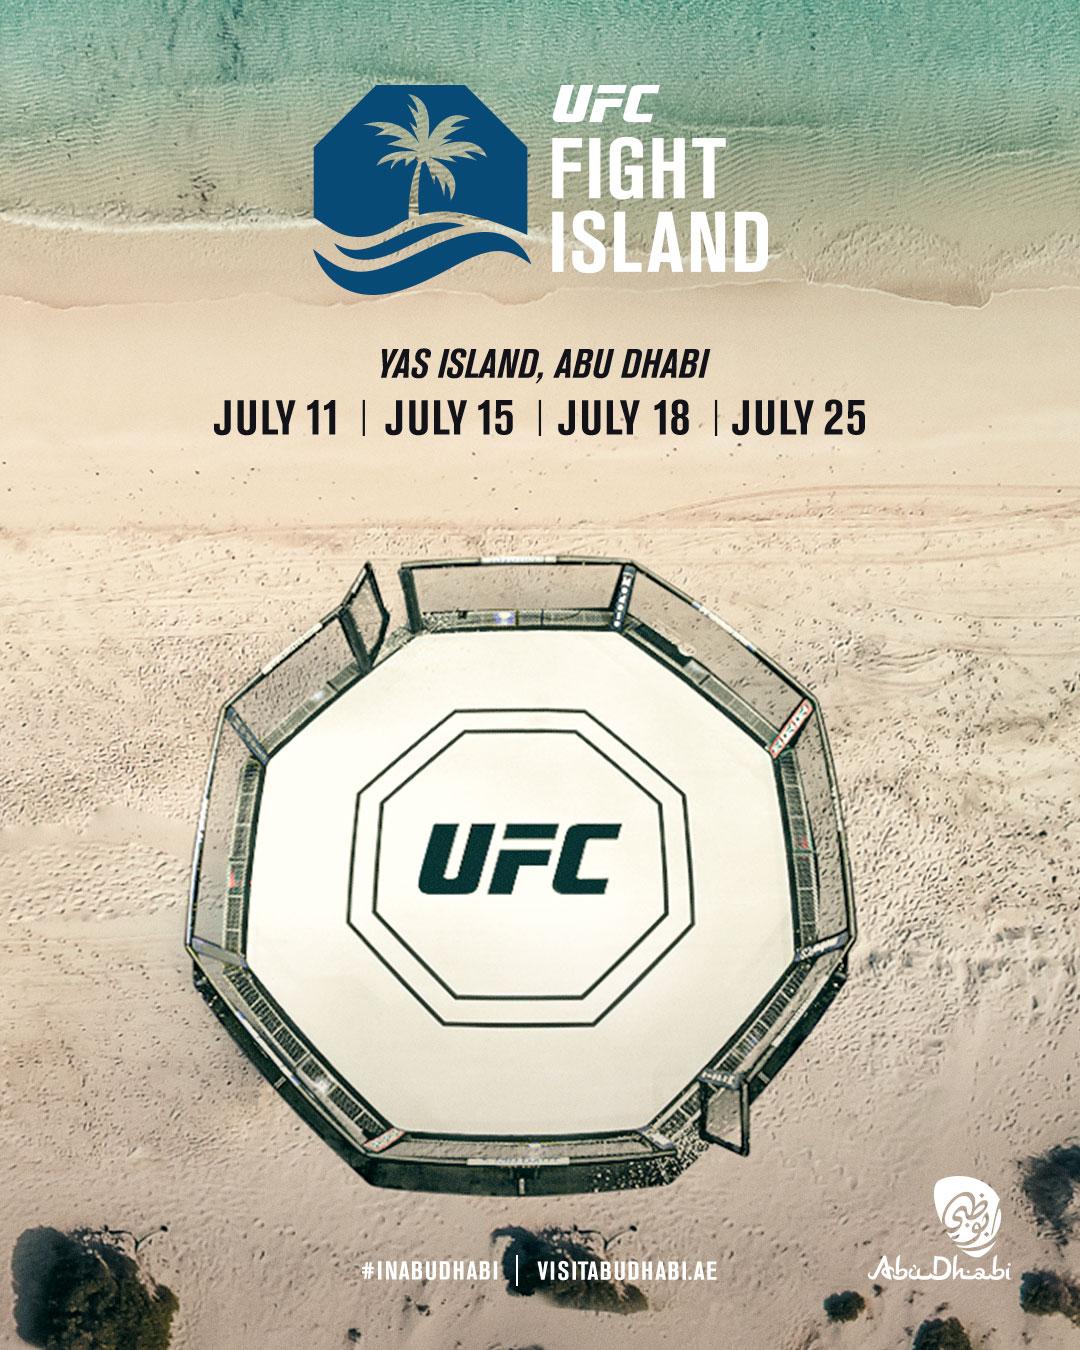 UFC Fight Island 4 results, Holm vs Aldana - FIGHTMAG